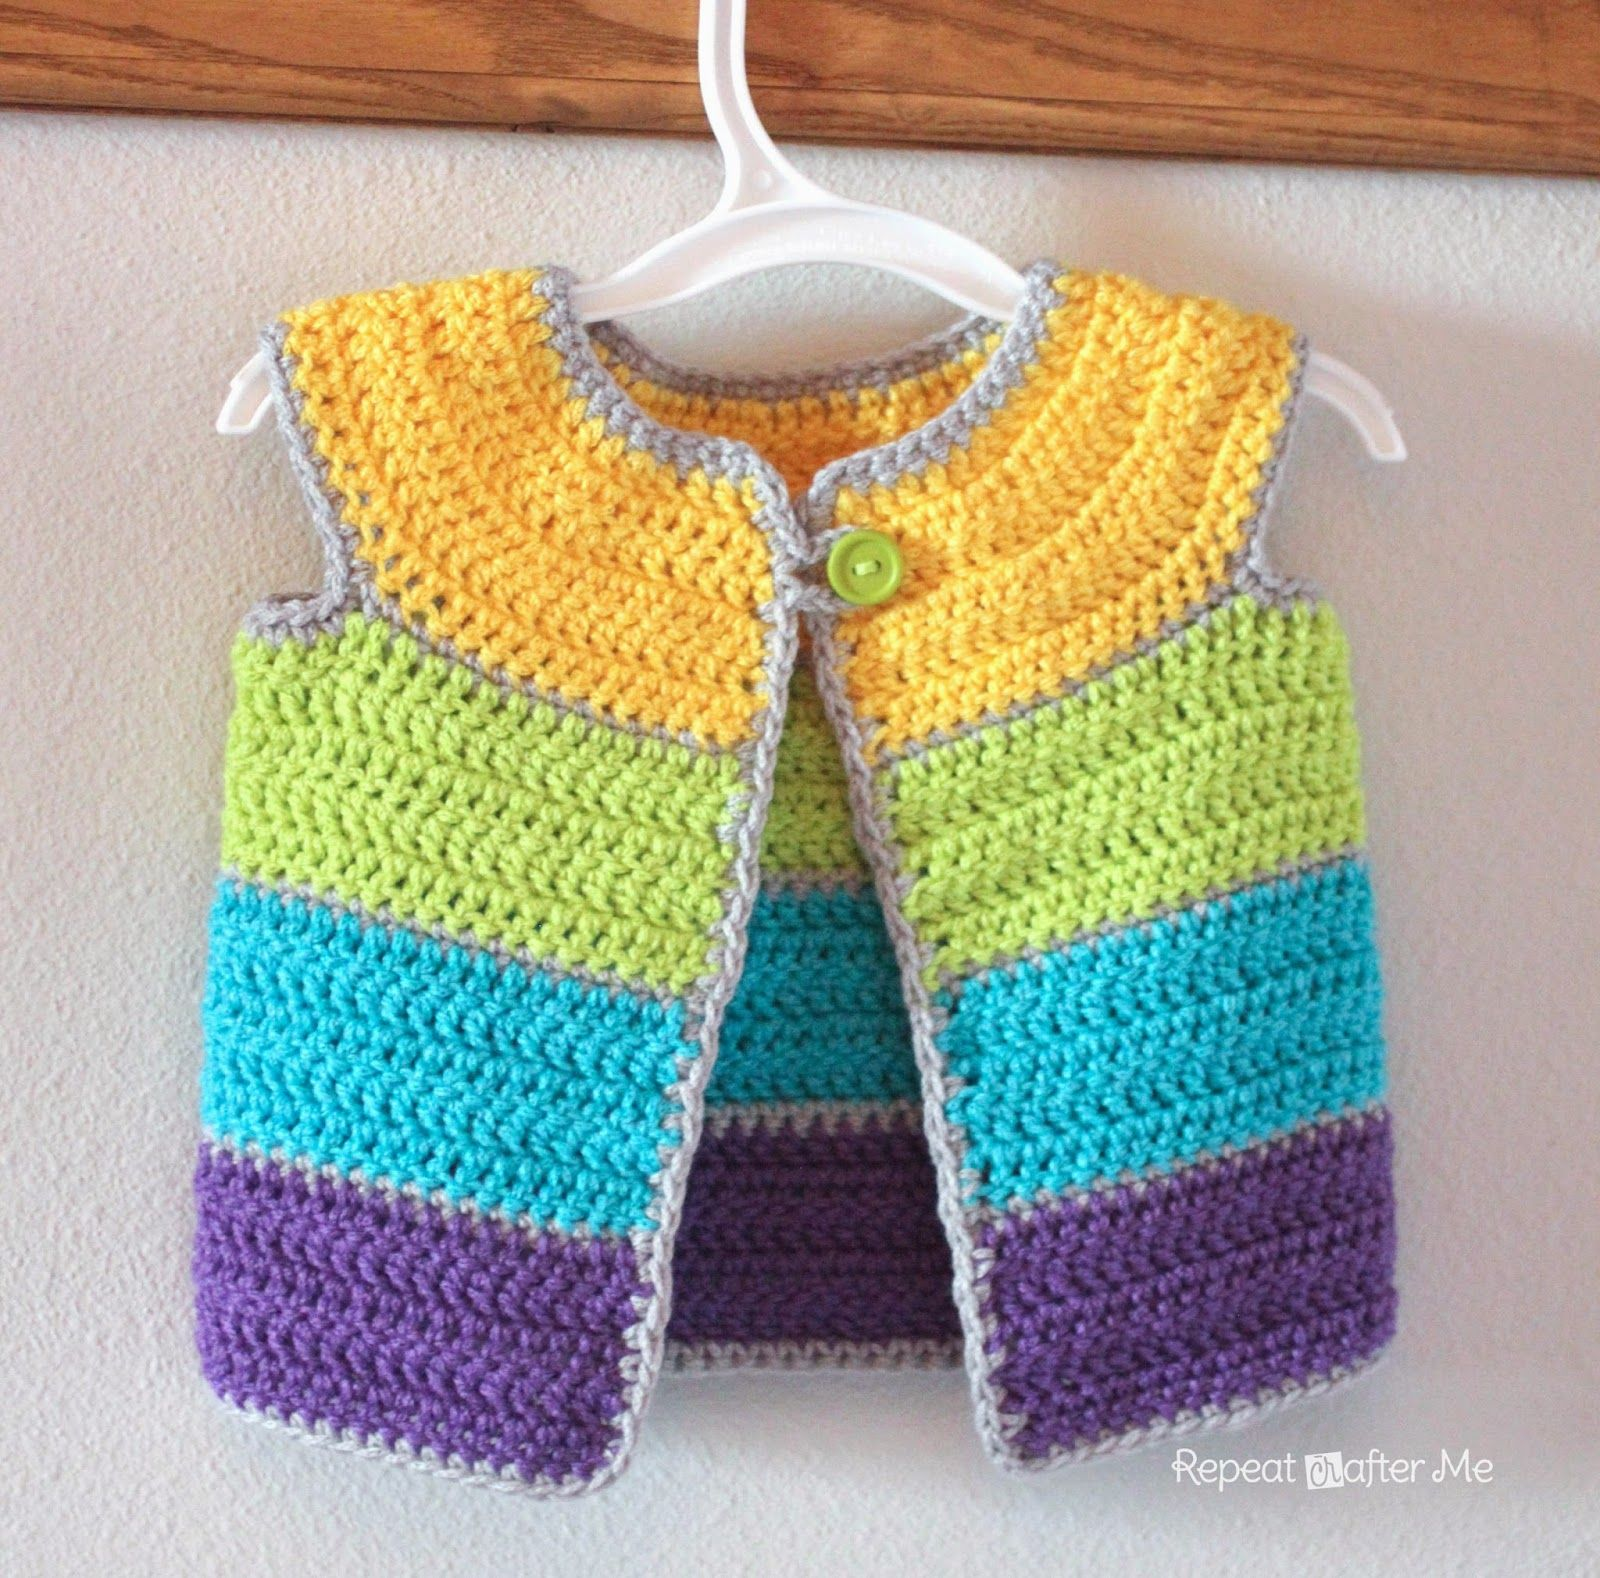 http://www.repeatcrafterme.com/2014/08/cap-sleeve-cardigan-crochet ...